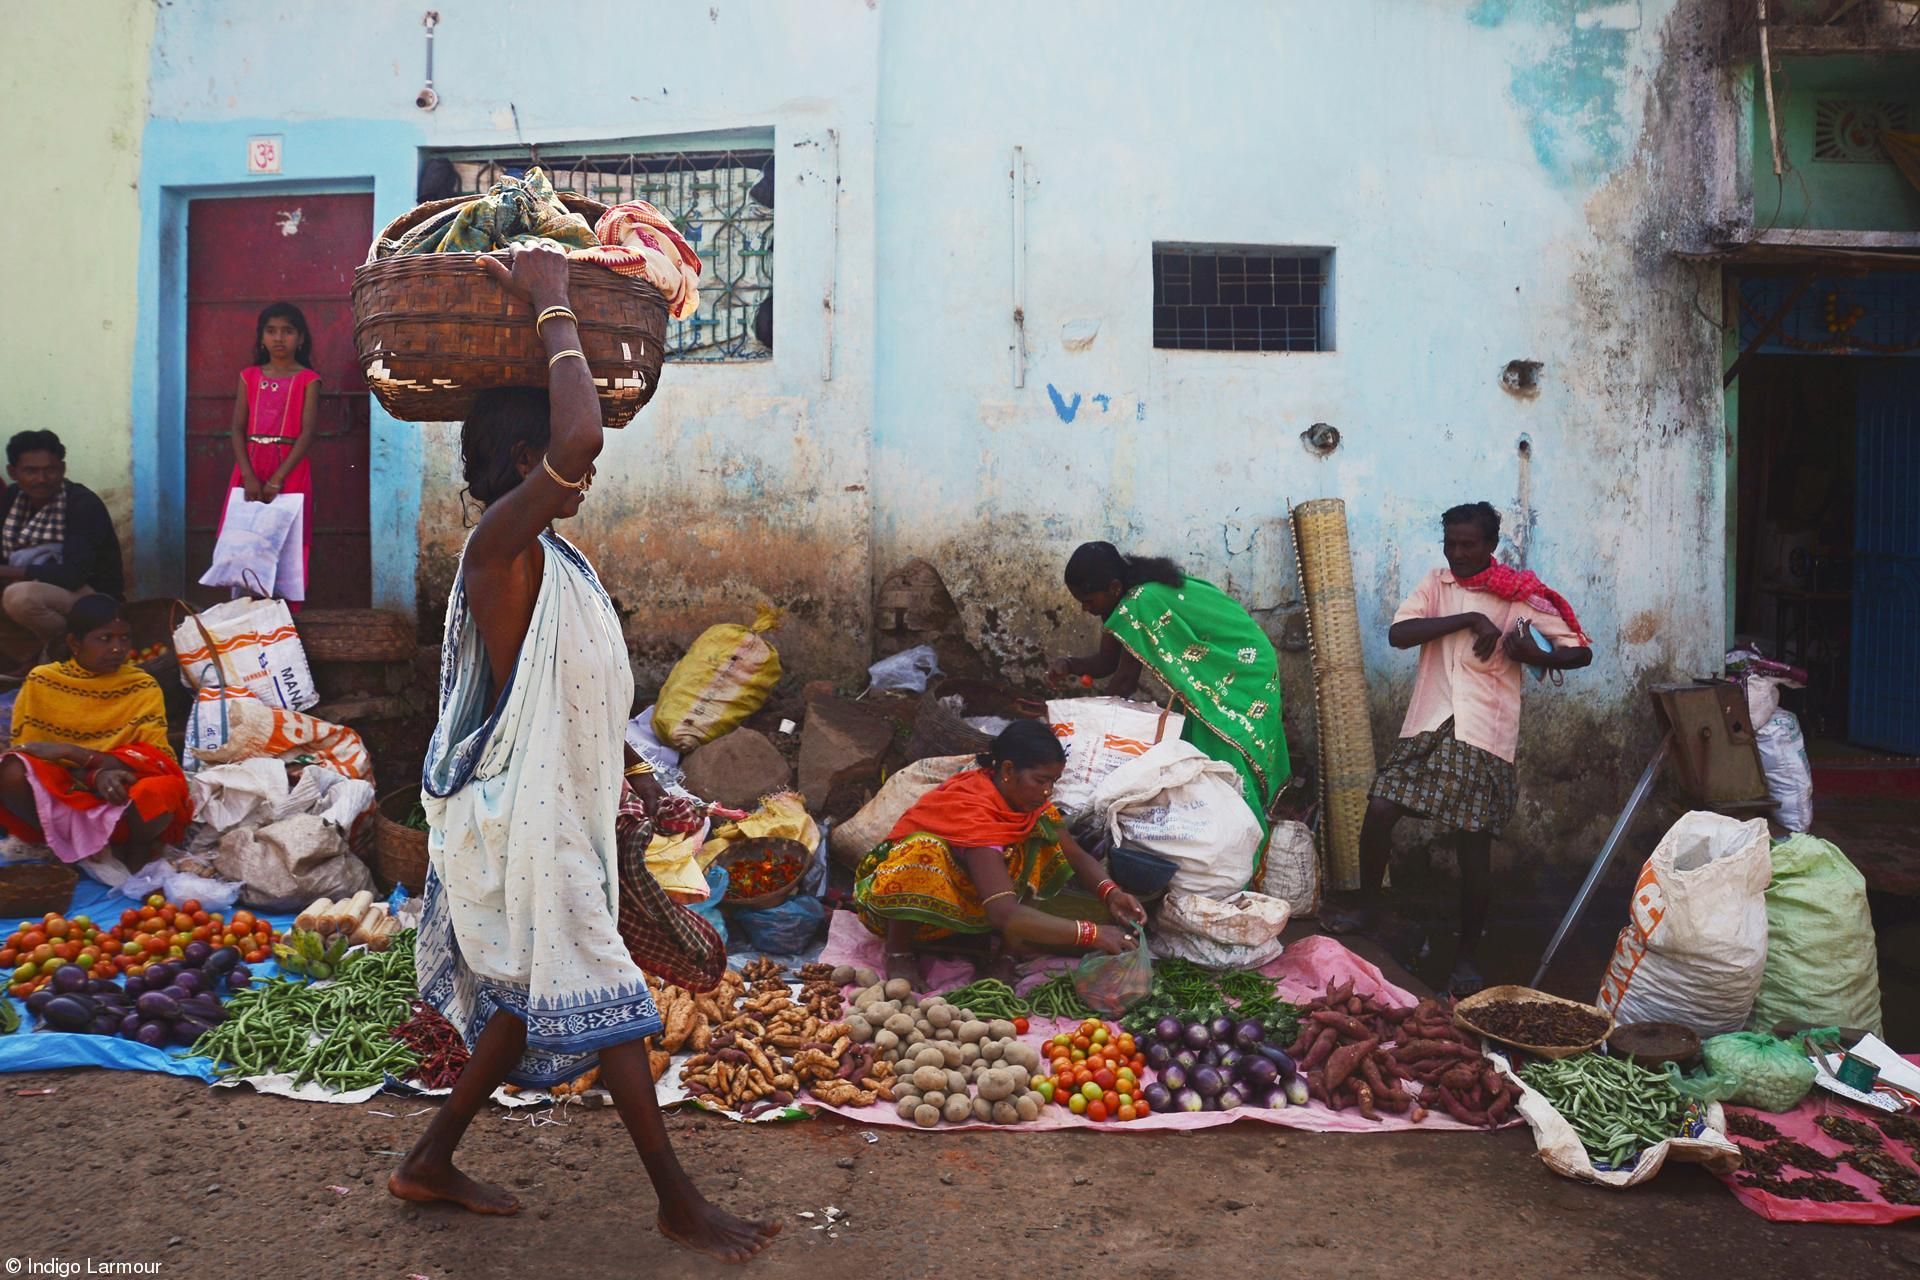 Young 11-14 - Indigo Larmour - Odisha Tribal Markets